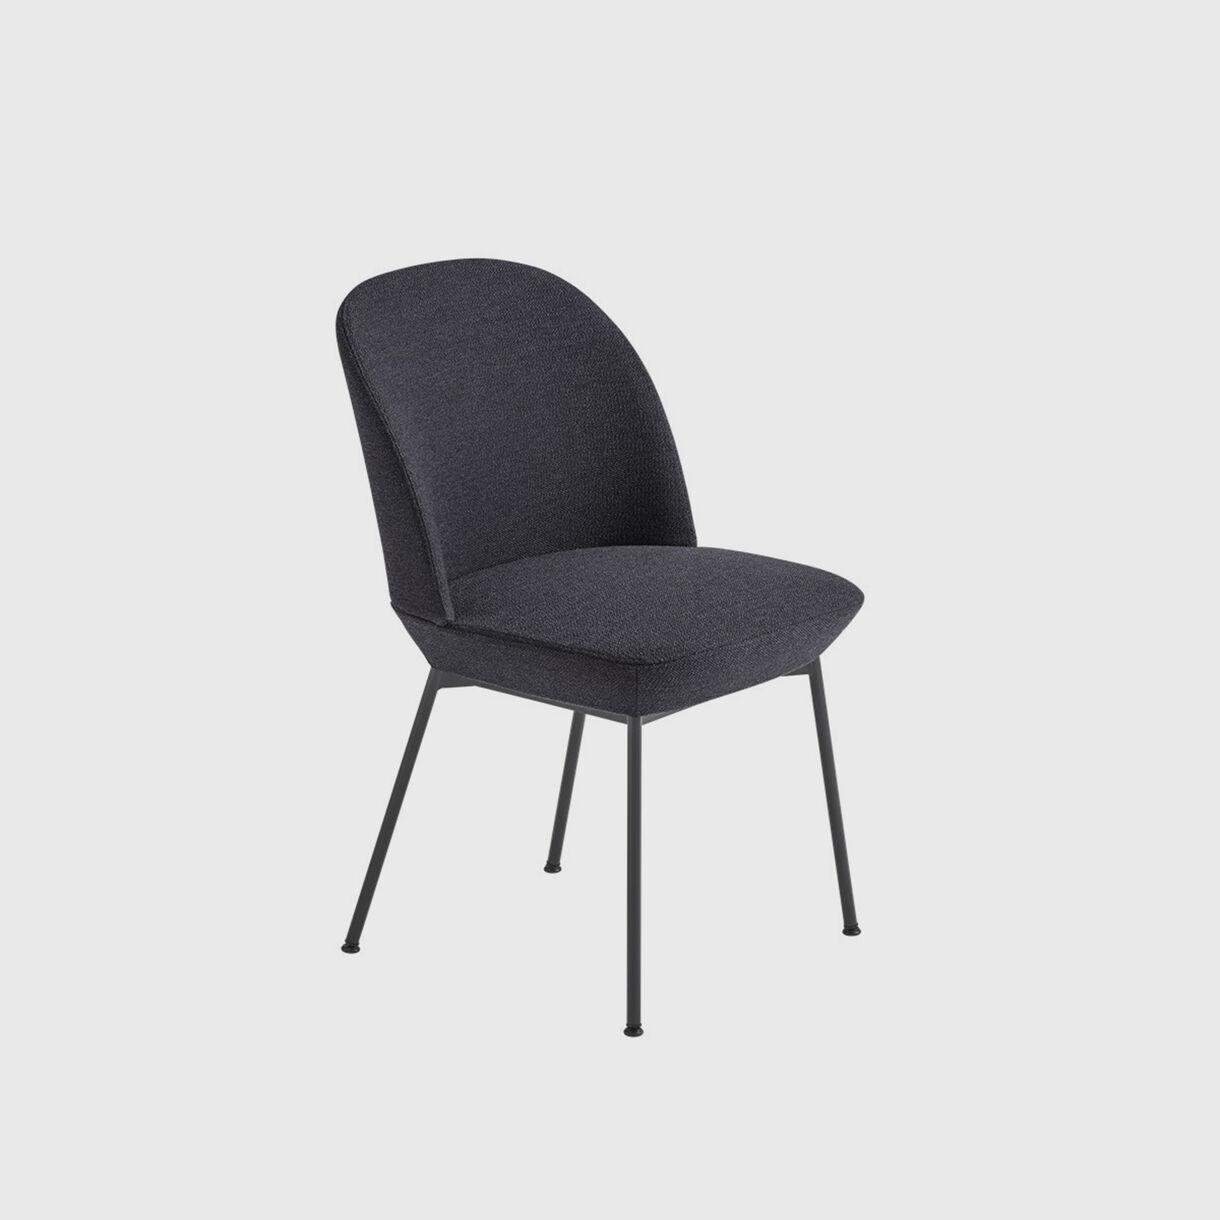 Oslo Side Chair - Ocean 601 & Black